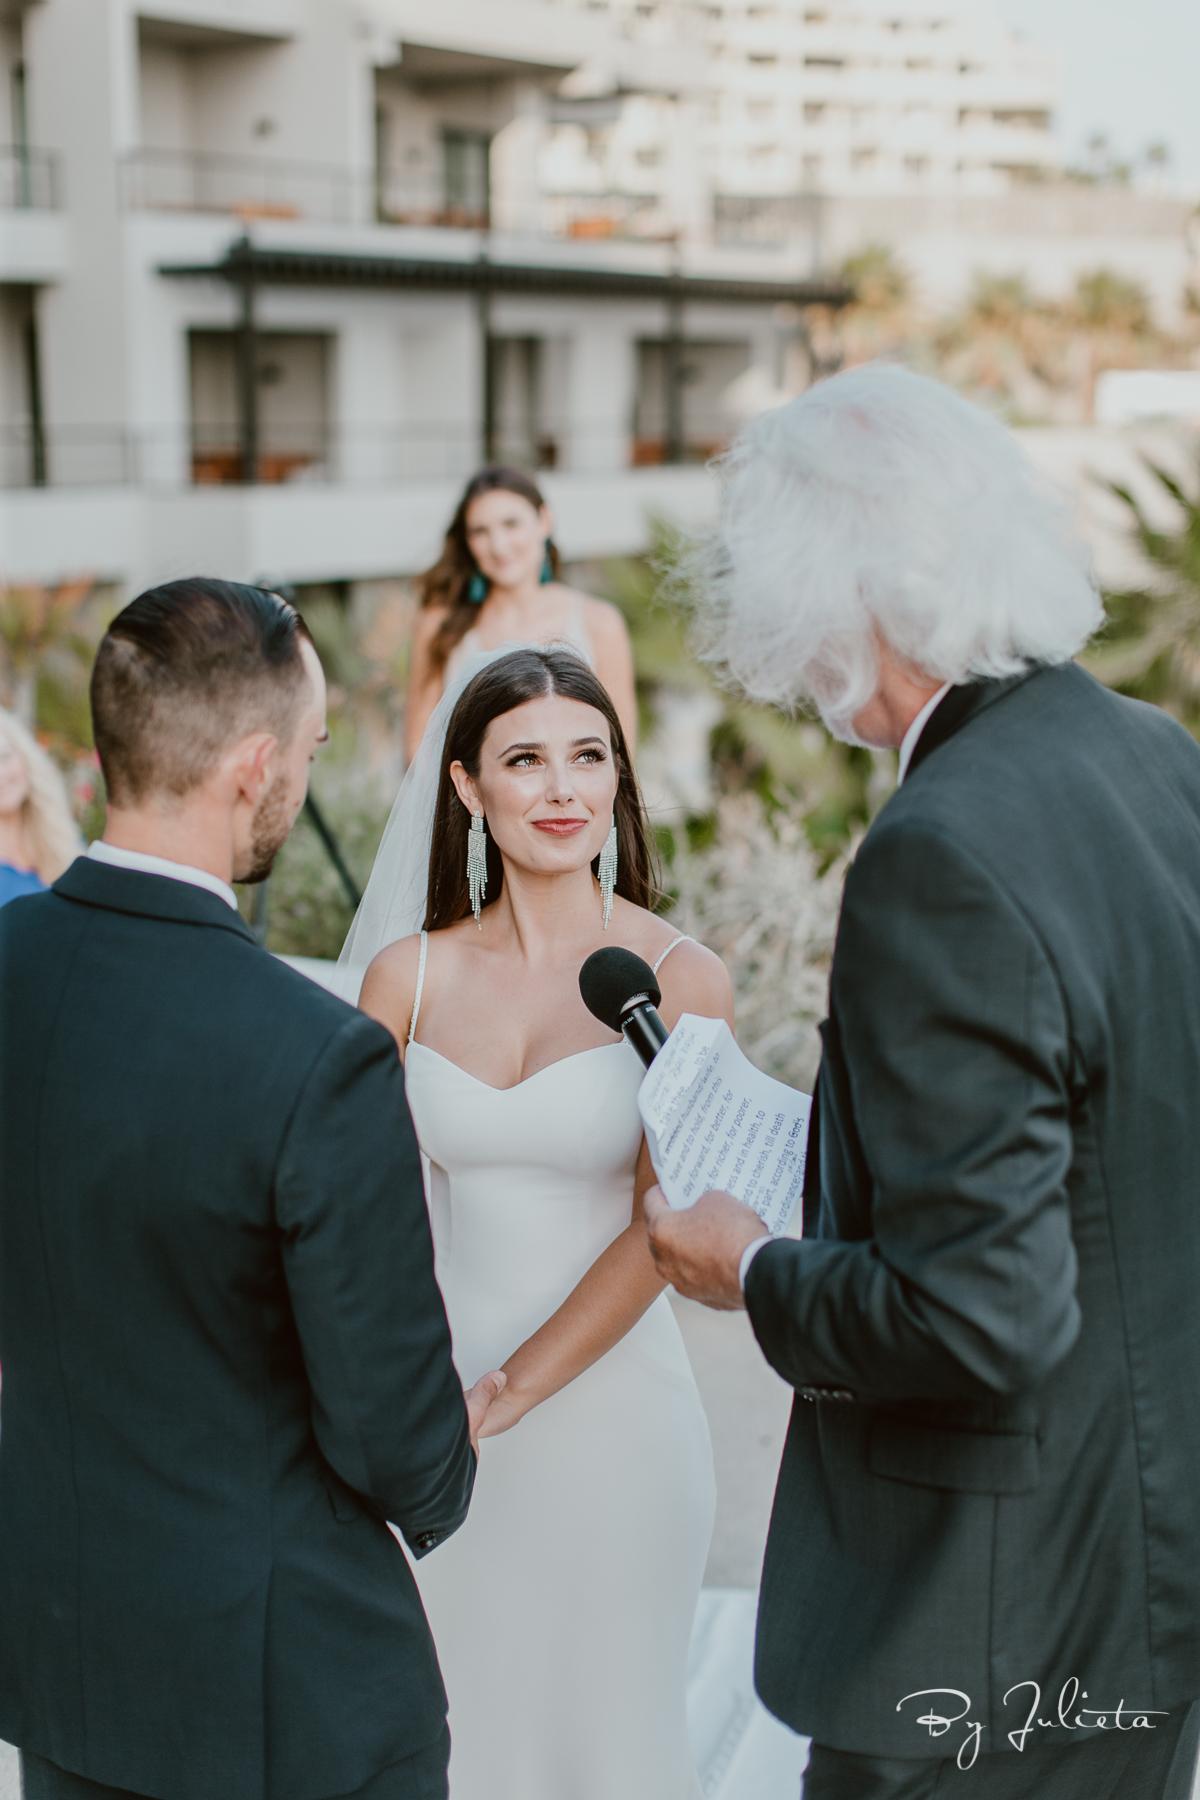 WeddingTheCapeCabo.B+G.JulietaAmezcuaPhotography.(279of533).jpg